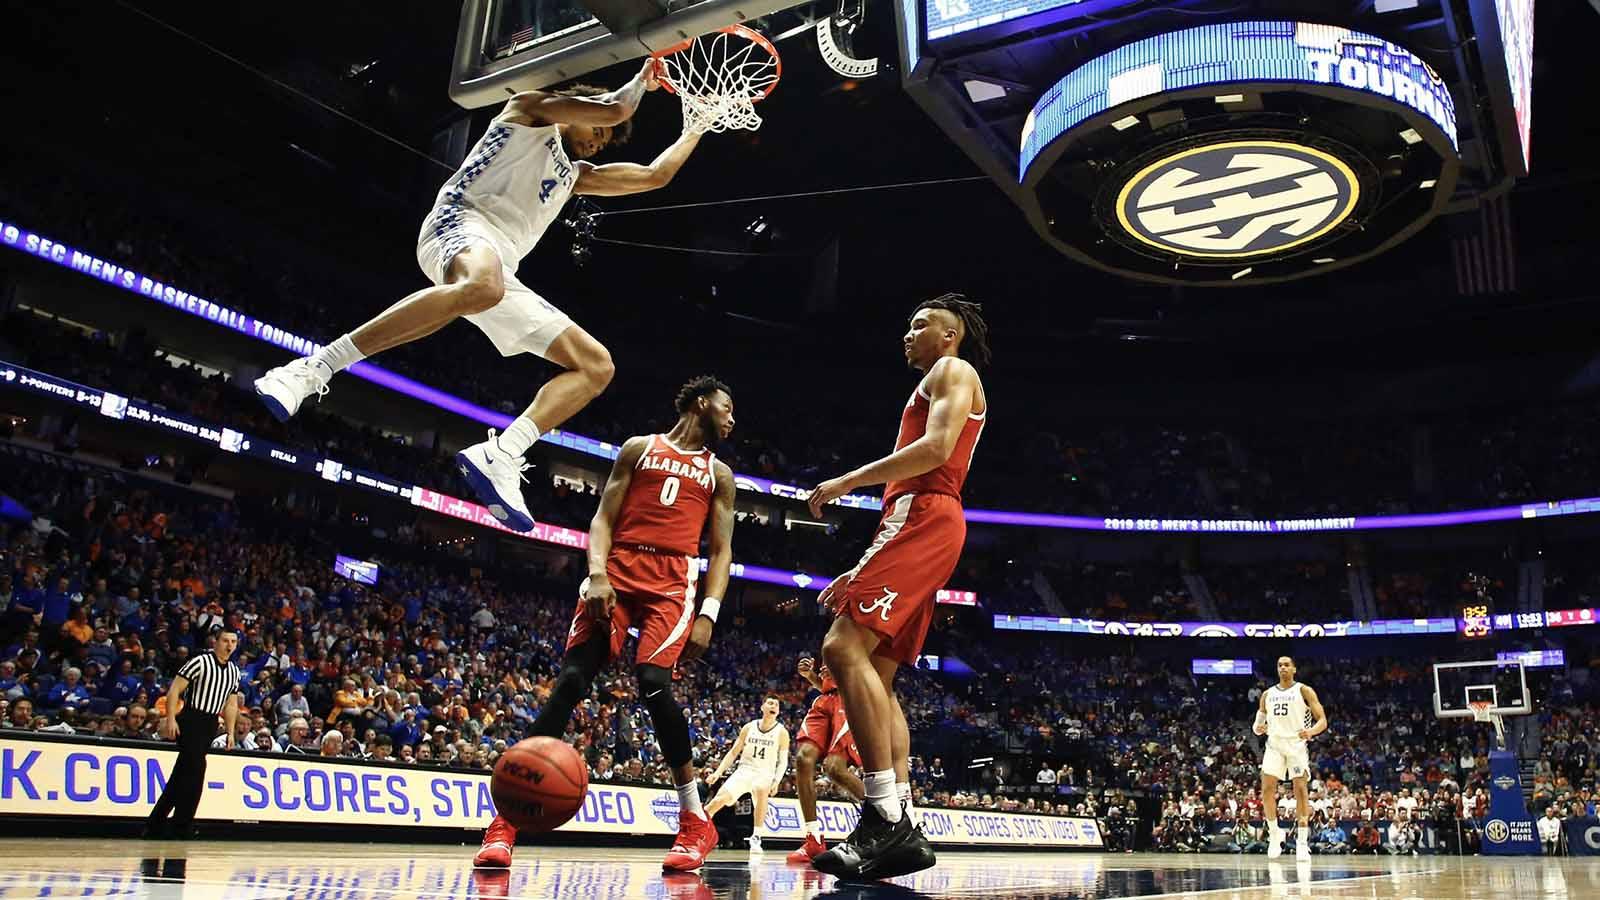 Nick Richards - Men's Basketball - University of Kentucky